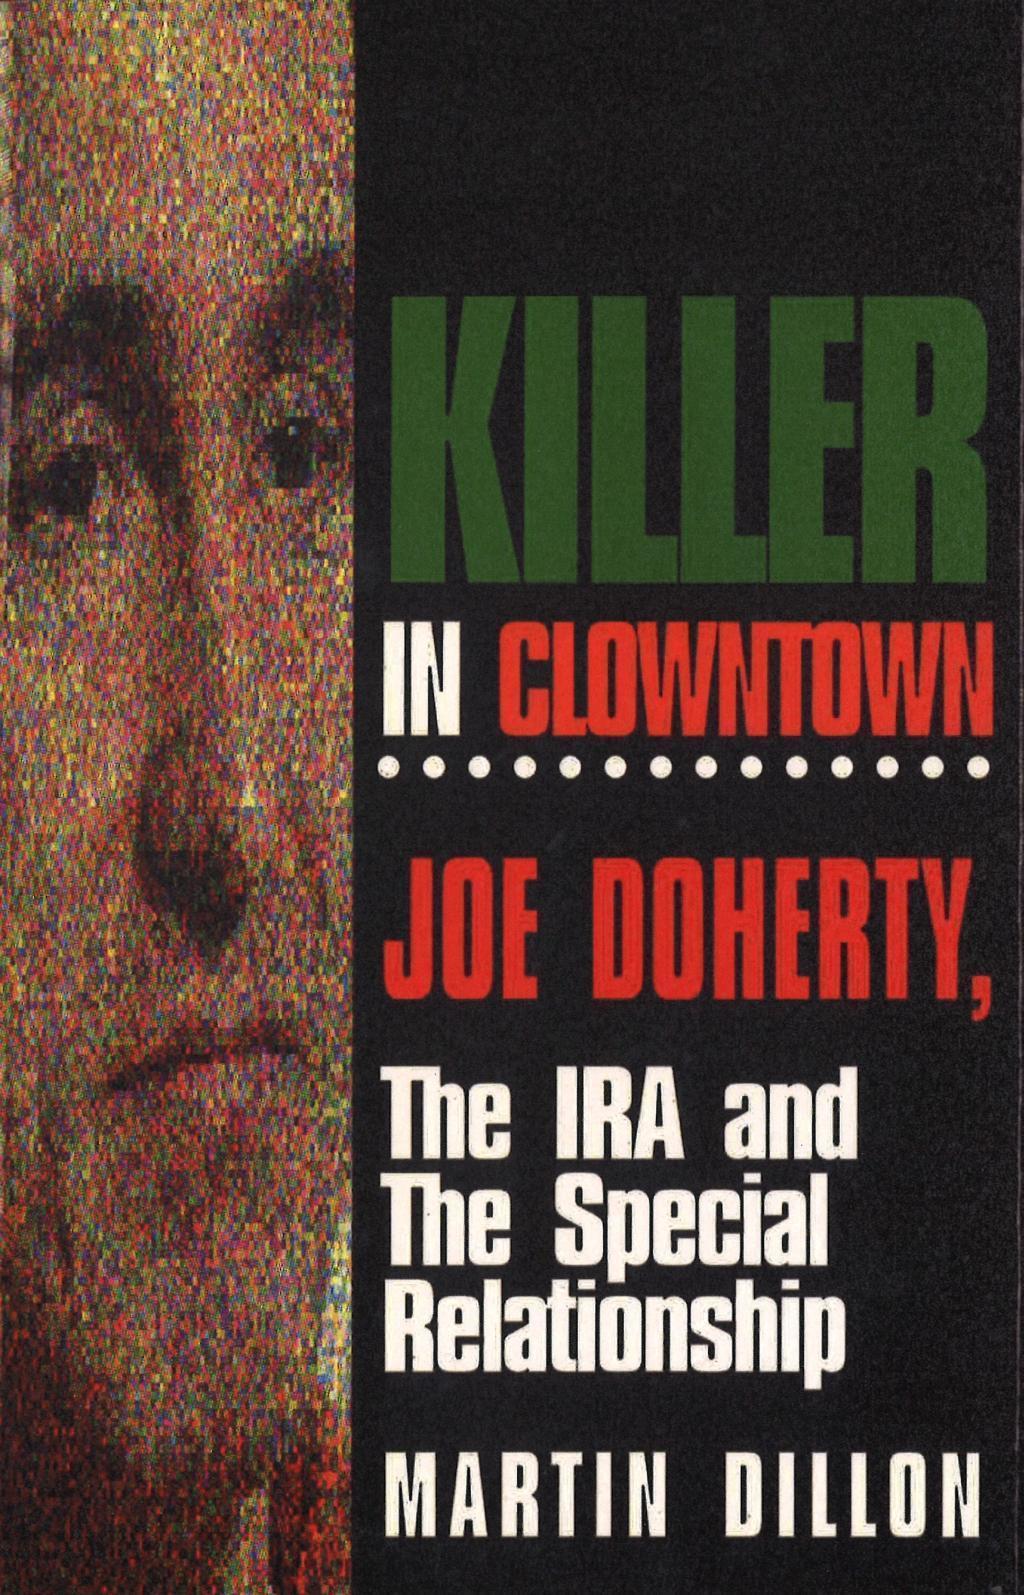 Killer In Clowntown